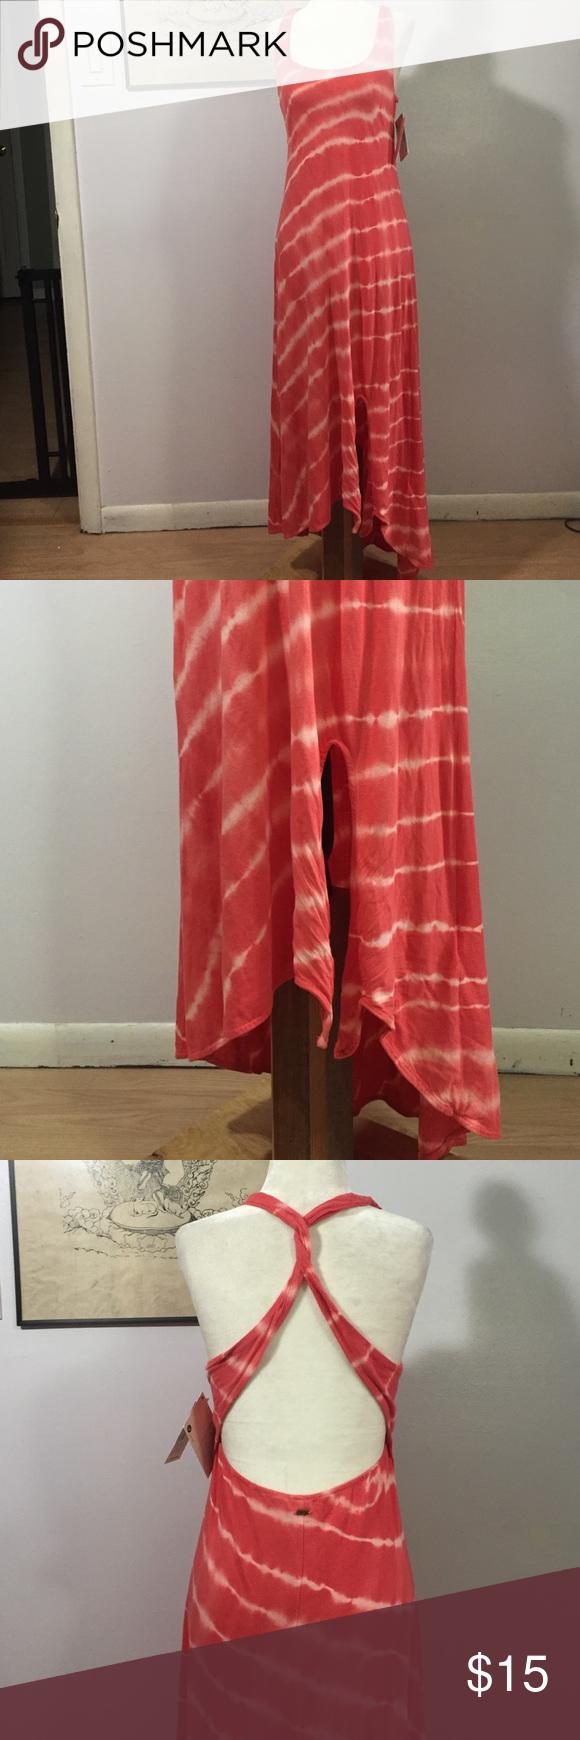 Roxy Tye Dyed Beachy Dress- Med NWT Super soft & comfortable viscose/rayon blend- brand new💖💕 Roxy Swim Coverups